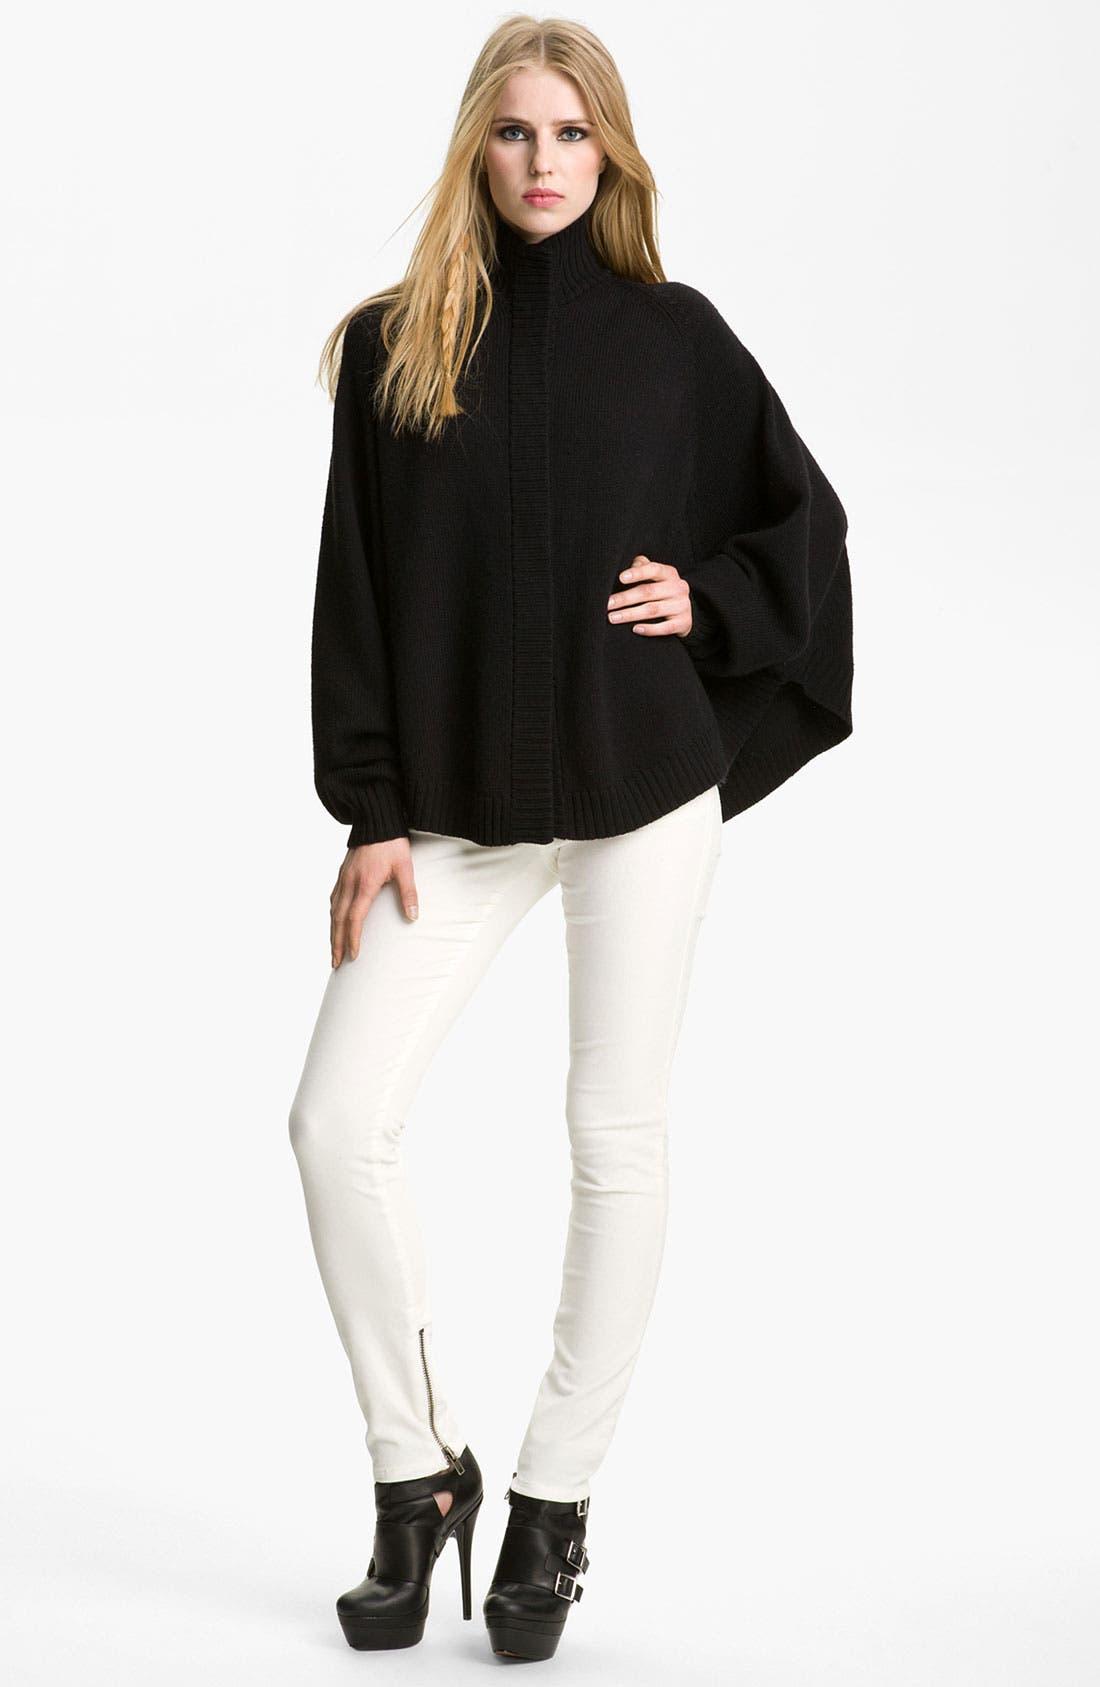 Alternate Image 1 Selected - Rachel Zoe 'Nina' Merino Wool Sweater Cape